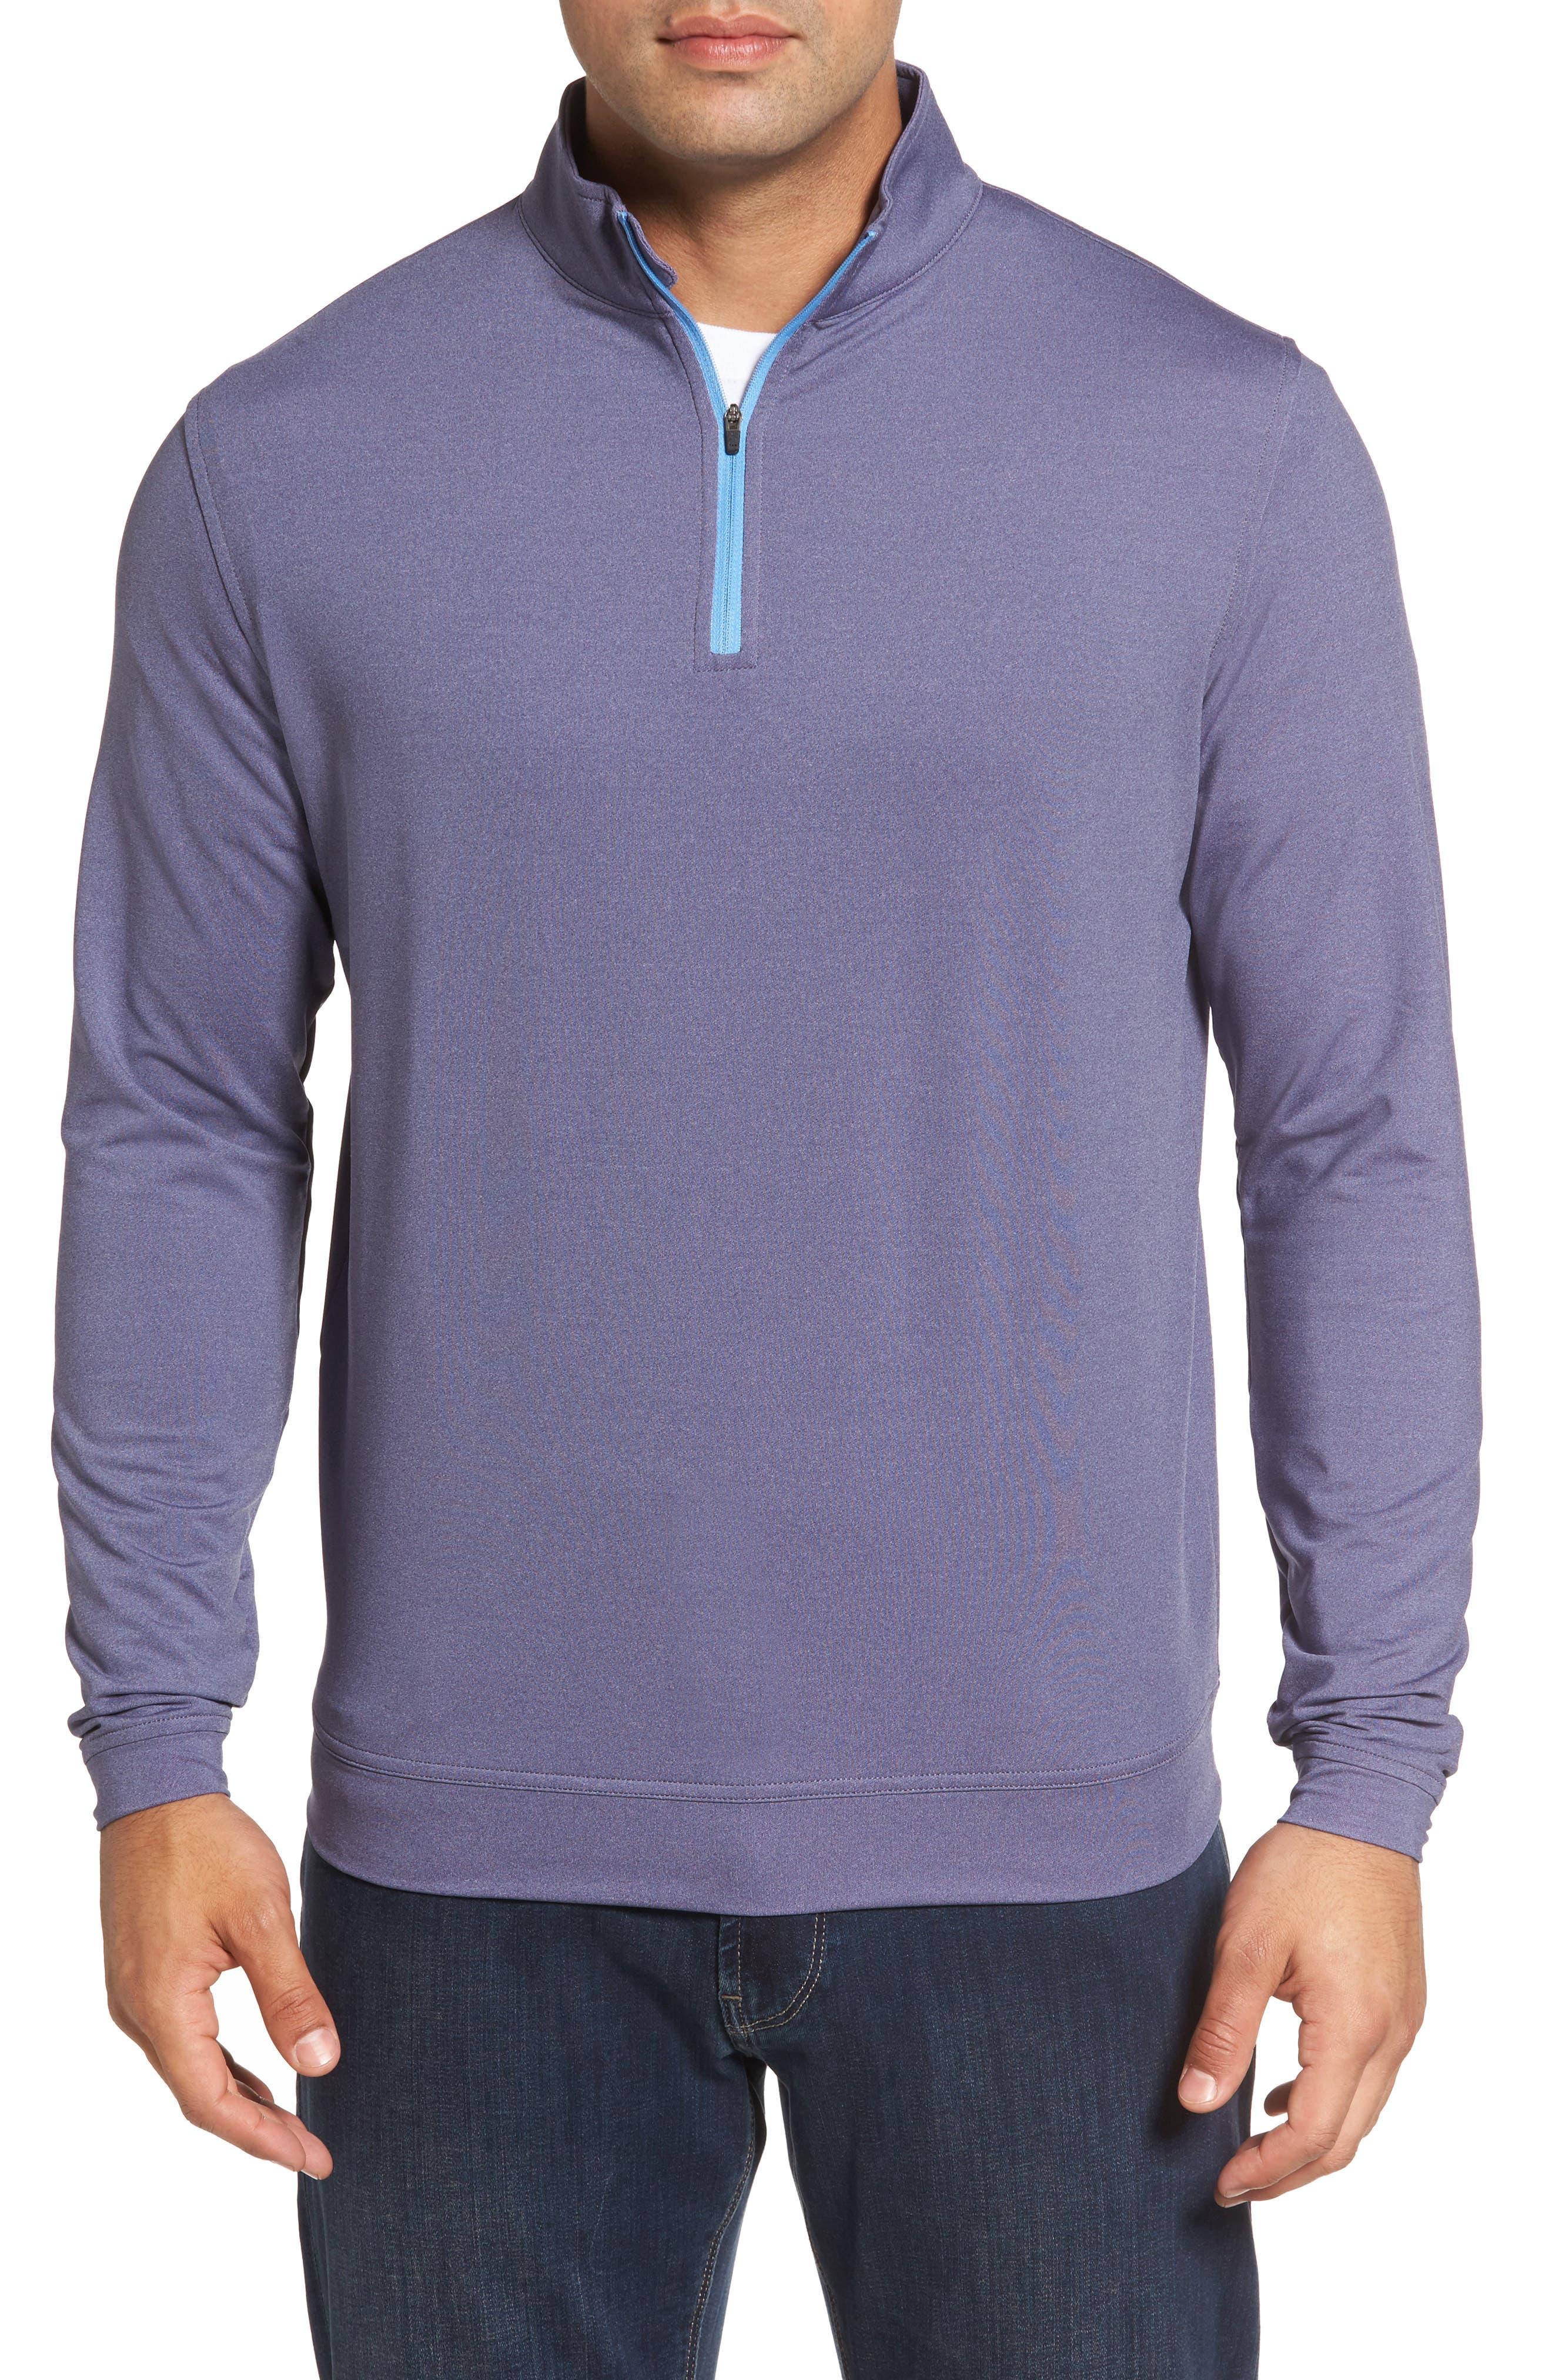 Peter Millar Perth Quarter Zip Stretch Pullover